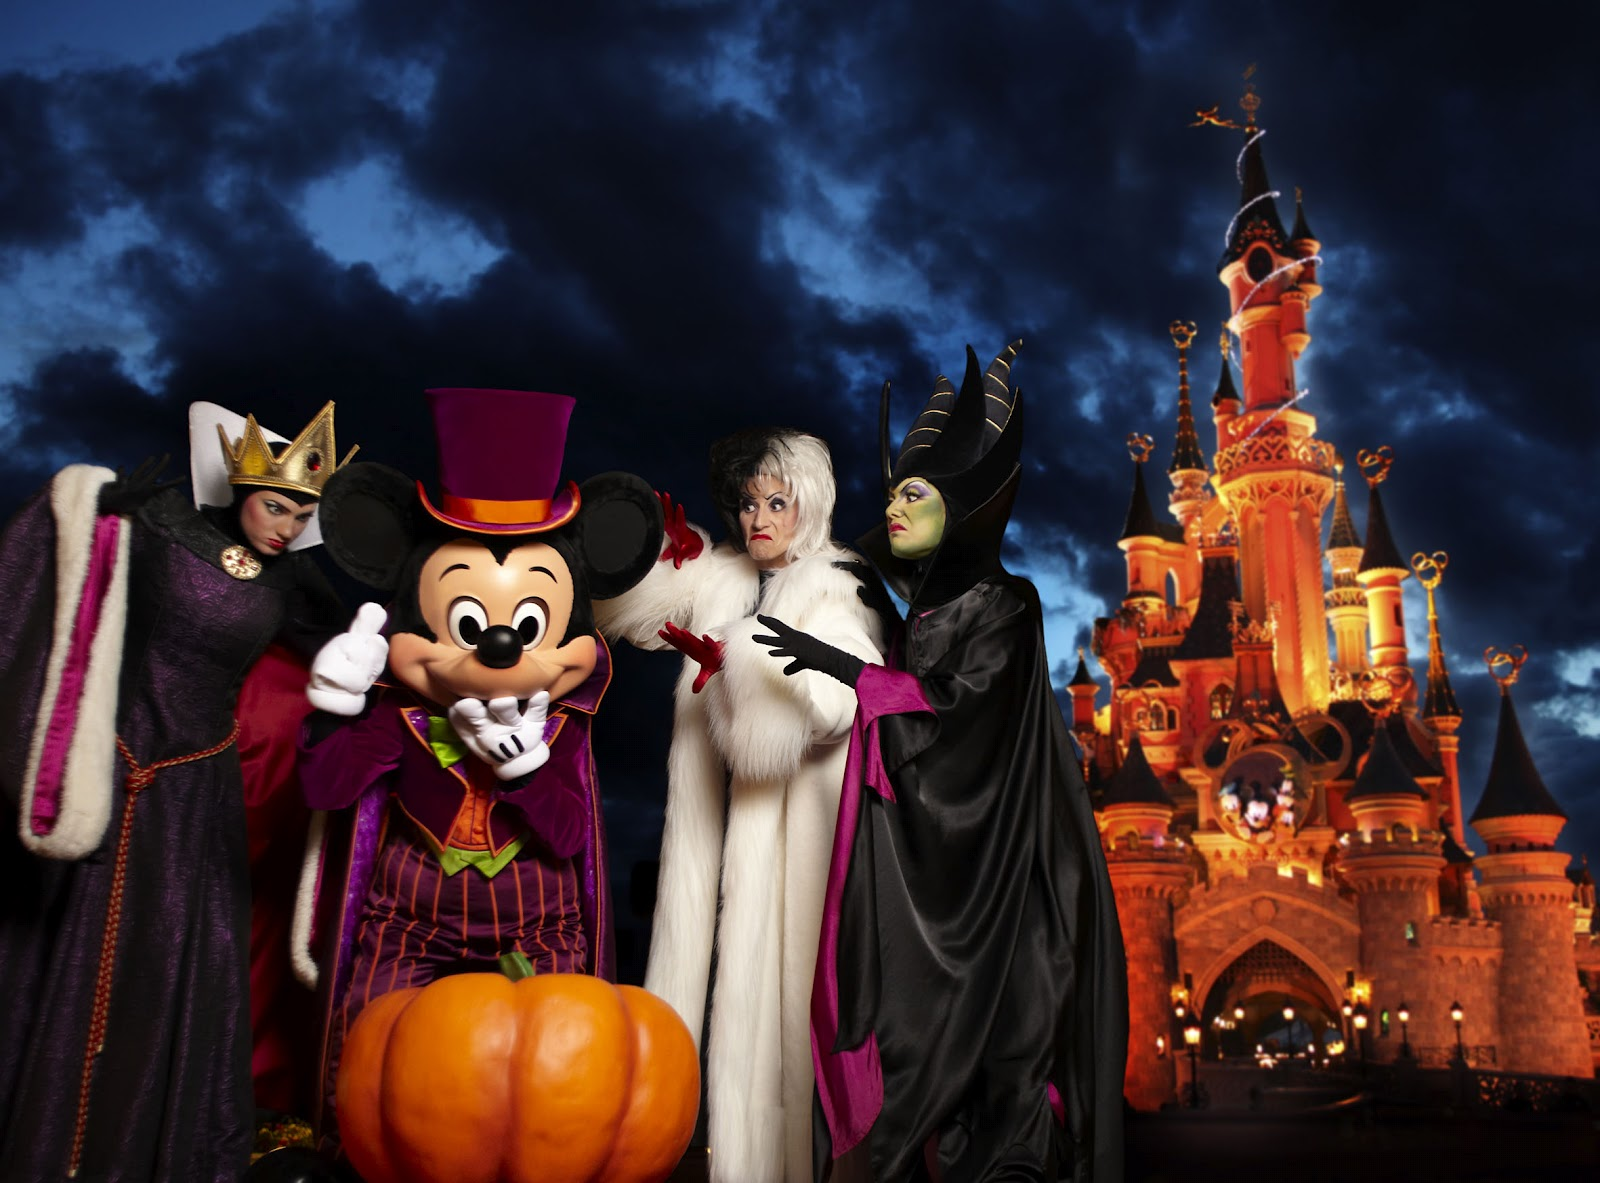 Joyeusement espiègle avec son festival halloween à disneyland paris